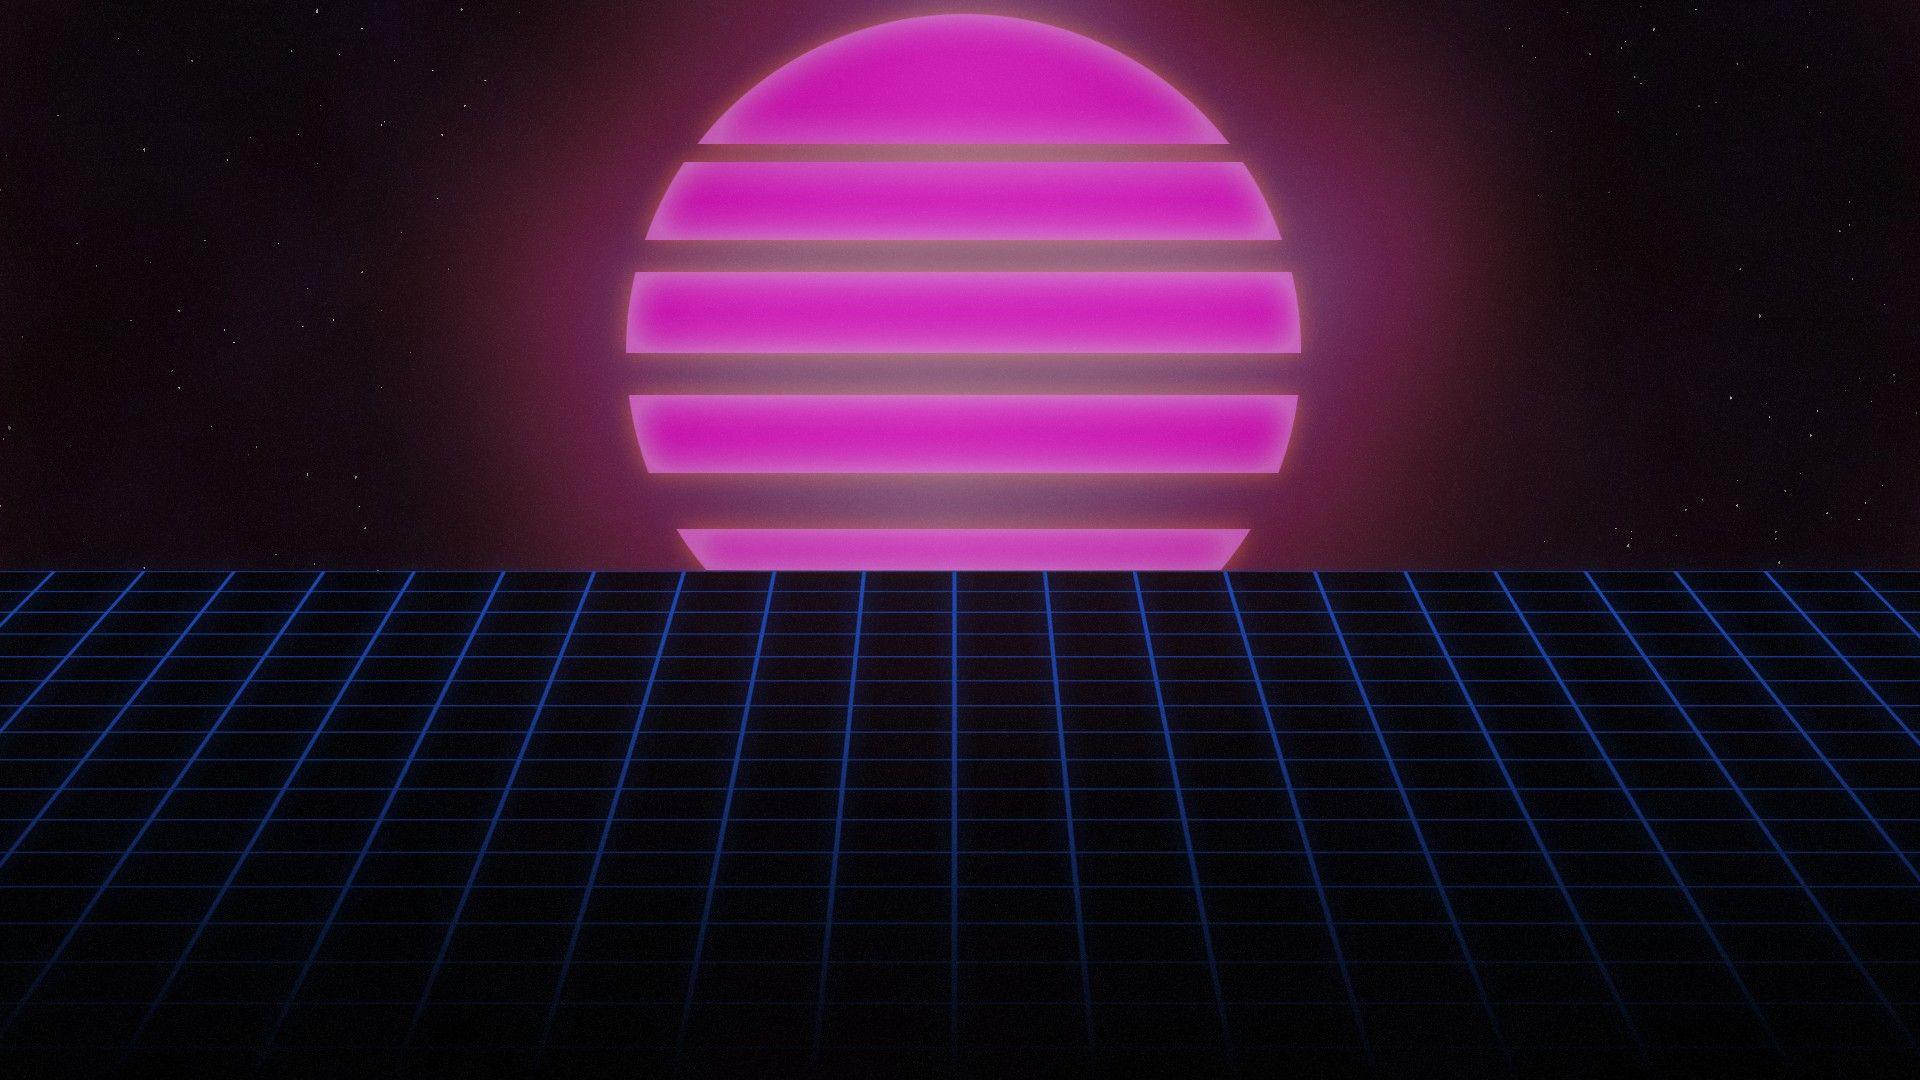 80s Sunset By Allieg3x On Deviantart Retro 80s Wallpapers Neon Wallpaper Minimalist Wallpaper 80s Neon